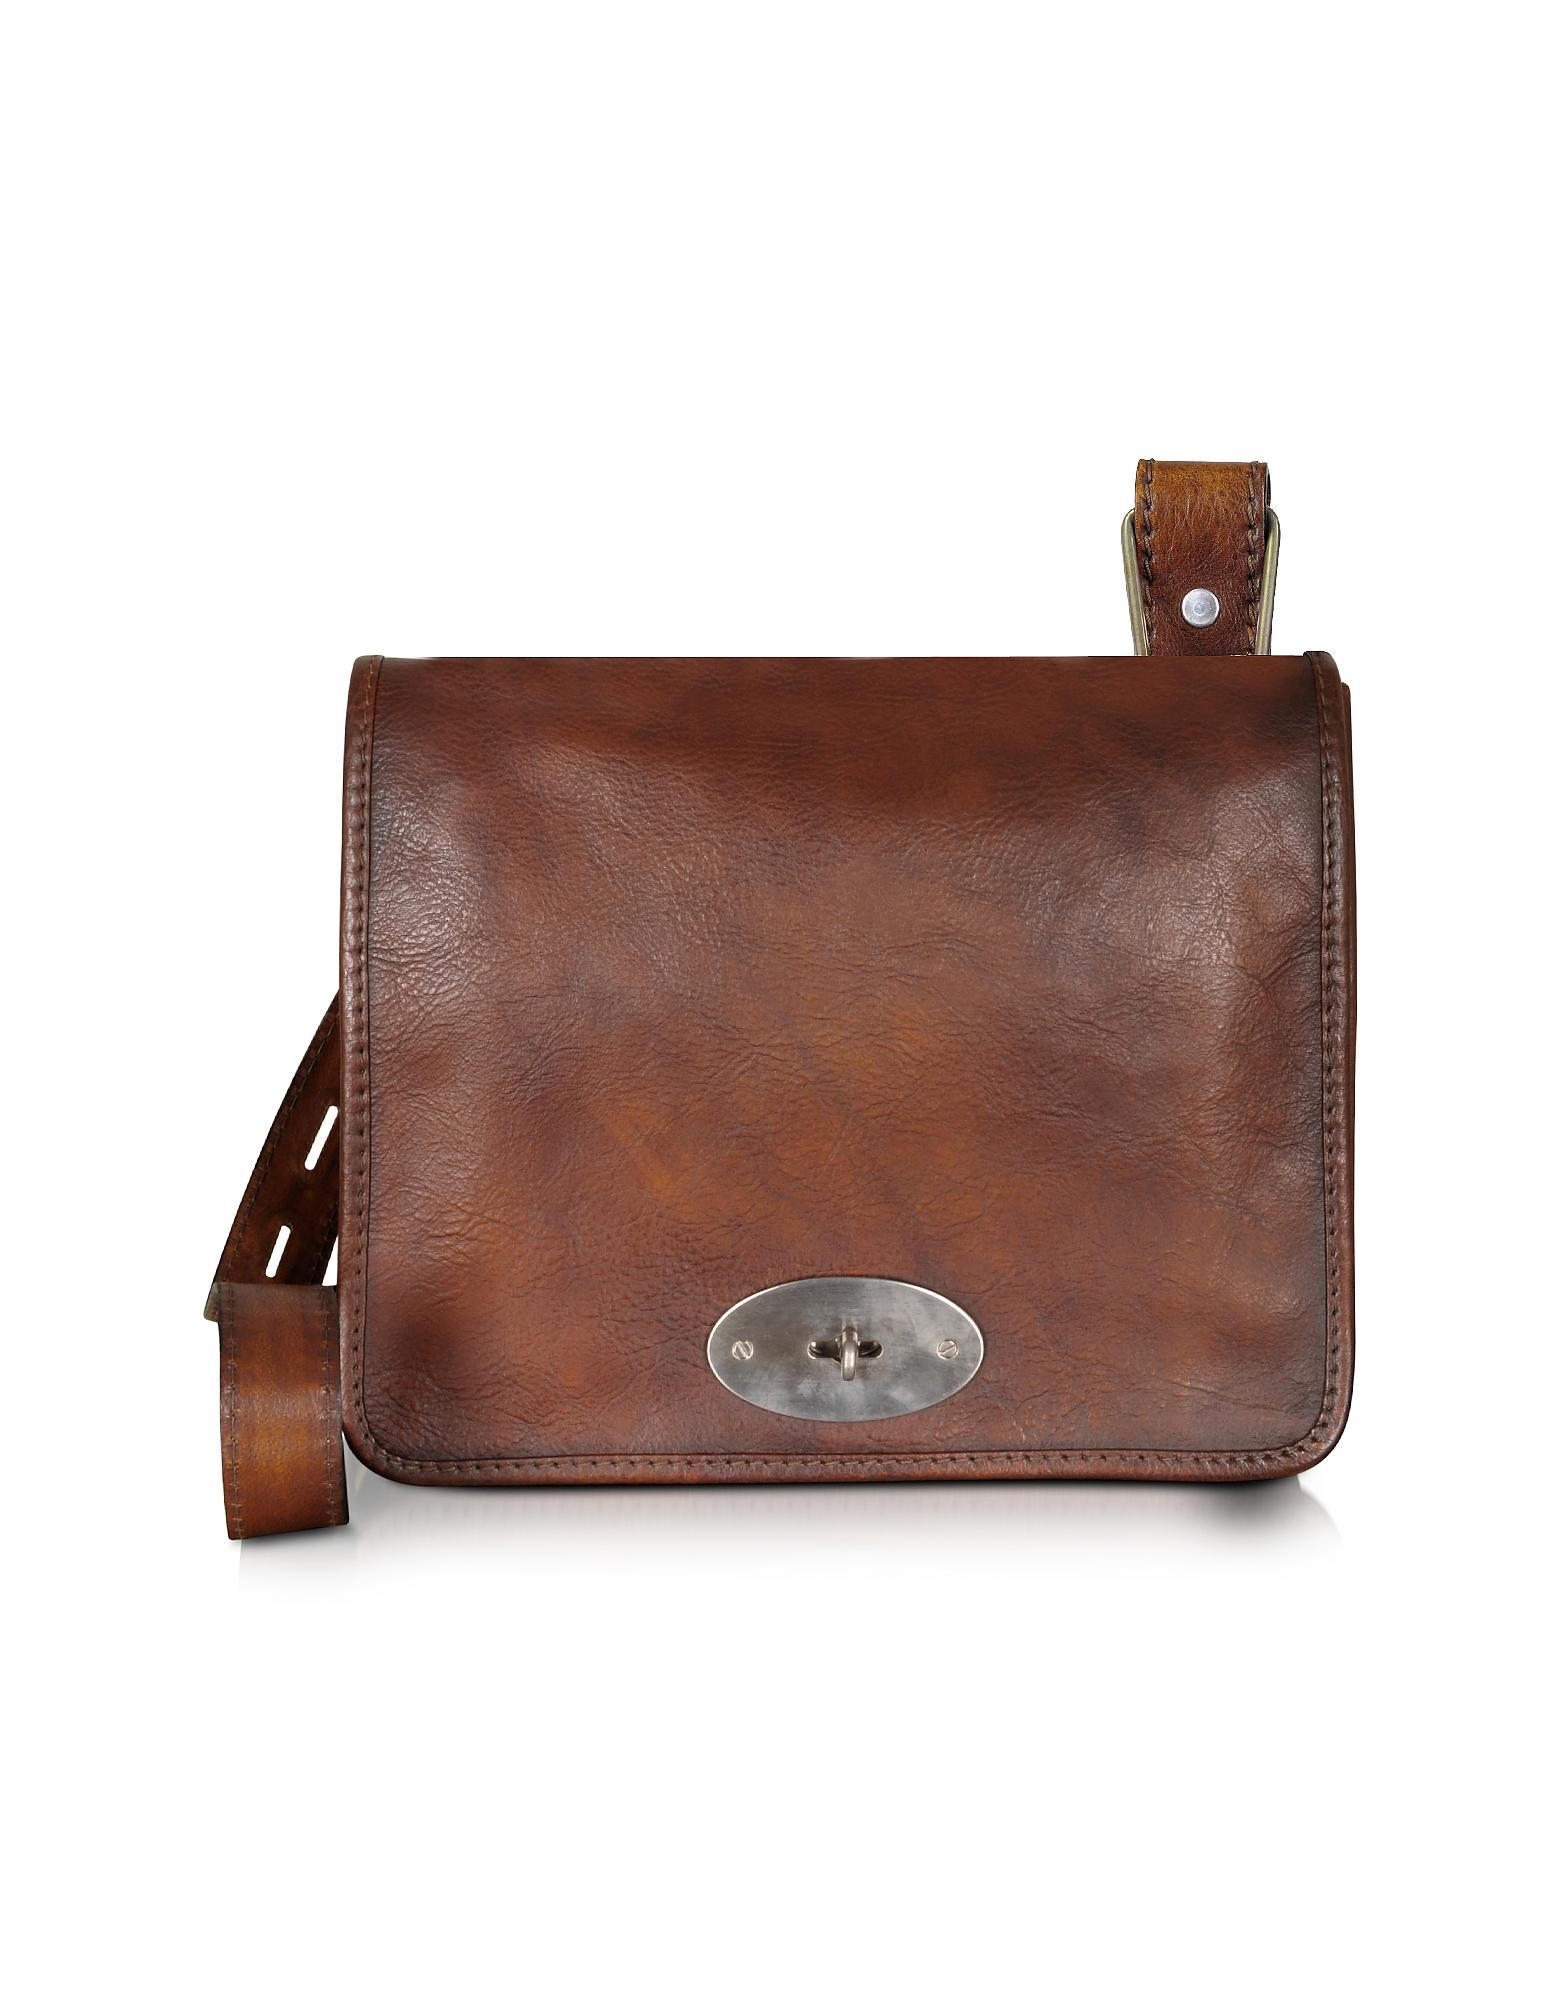 Pratesi Designer Handbags,  Genuine Leather Crossbody Bag